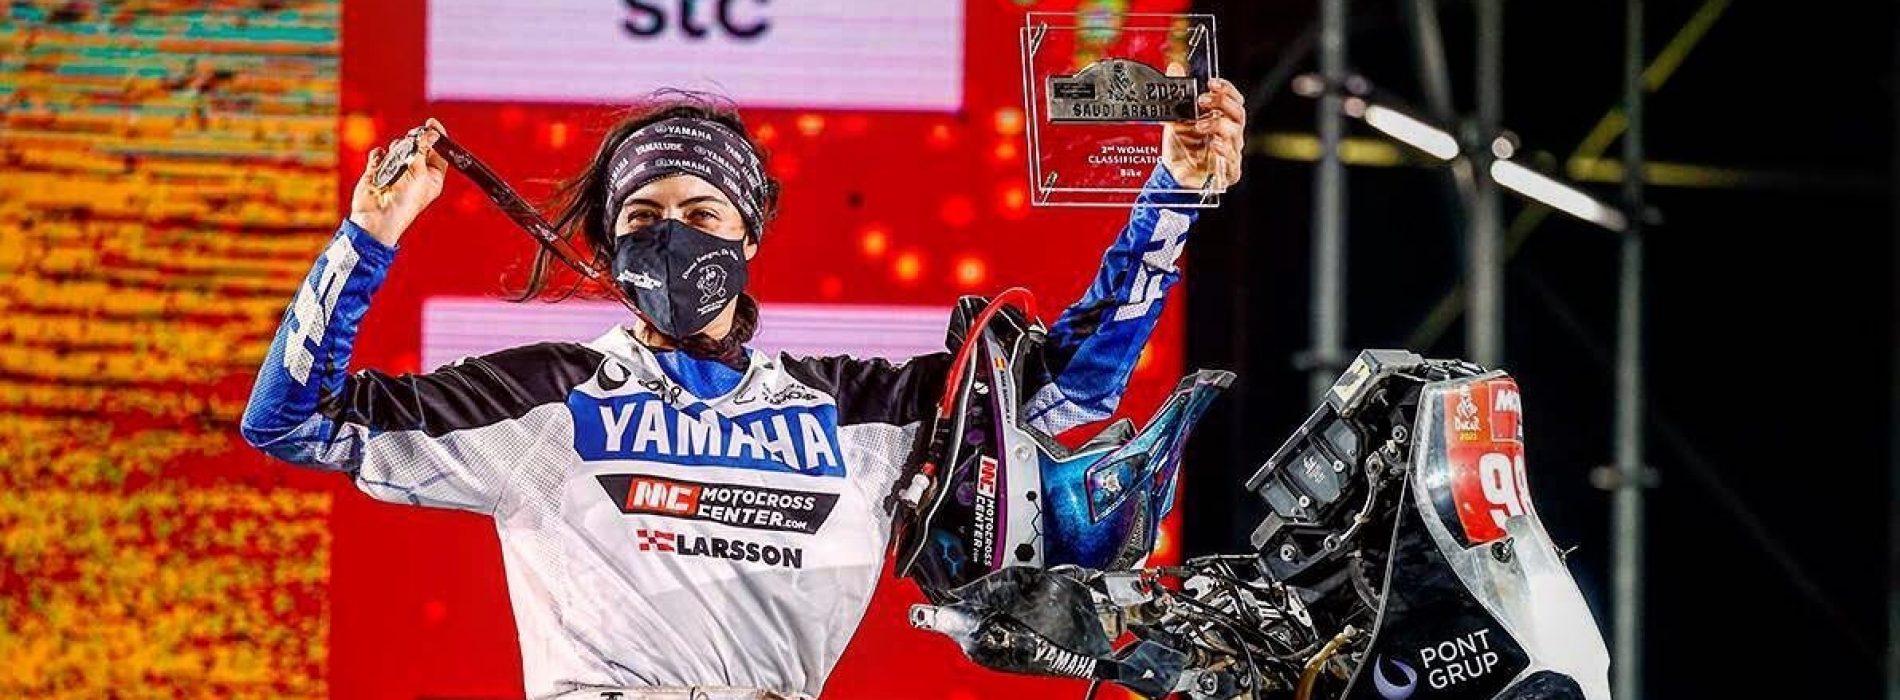 Sara Garcia- only female to race and finish Dakar Rally Malle Moto 2021